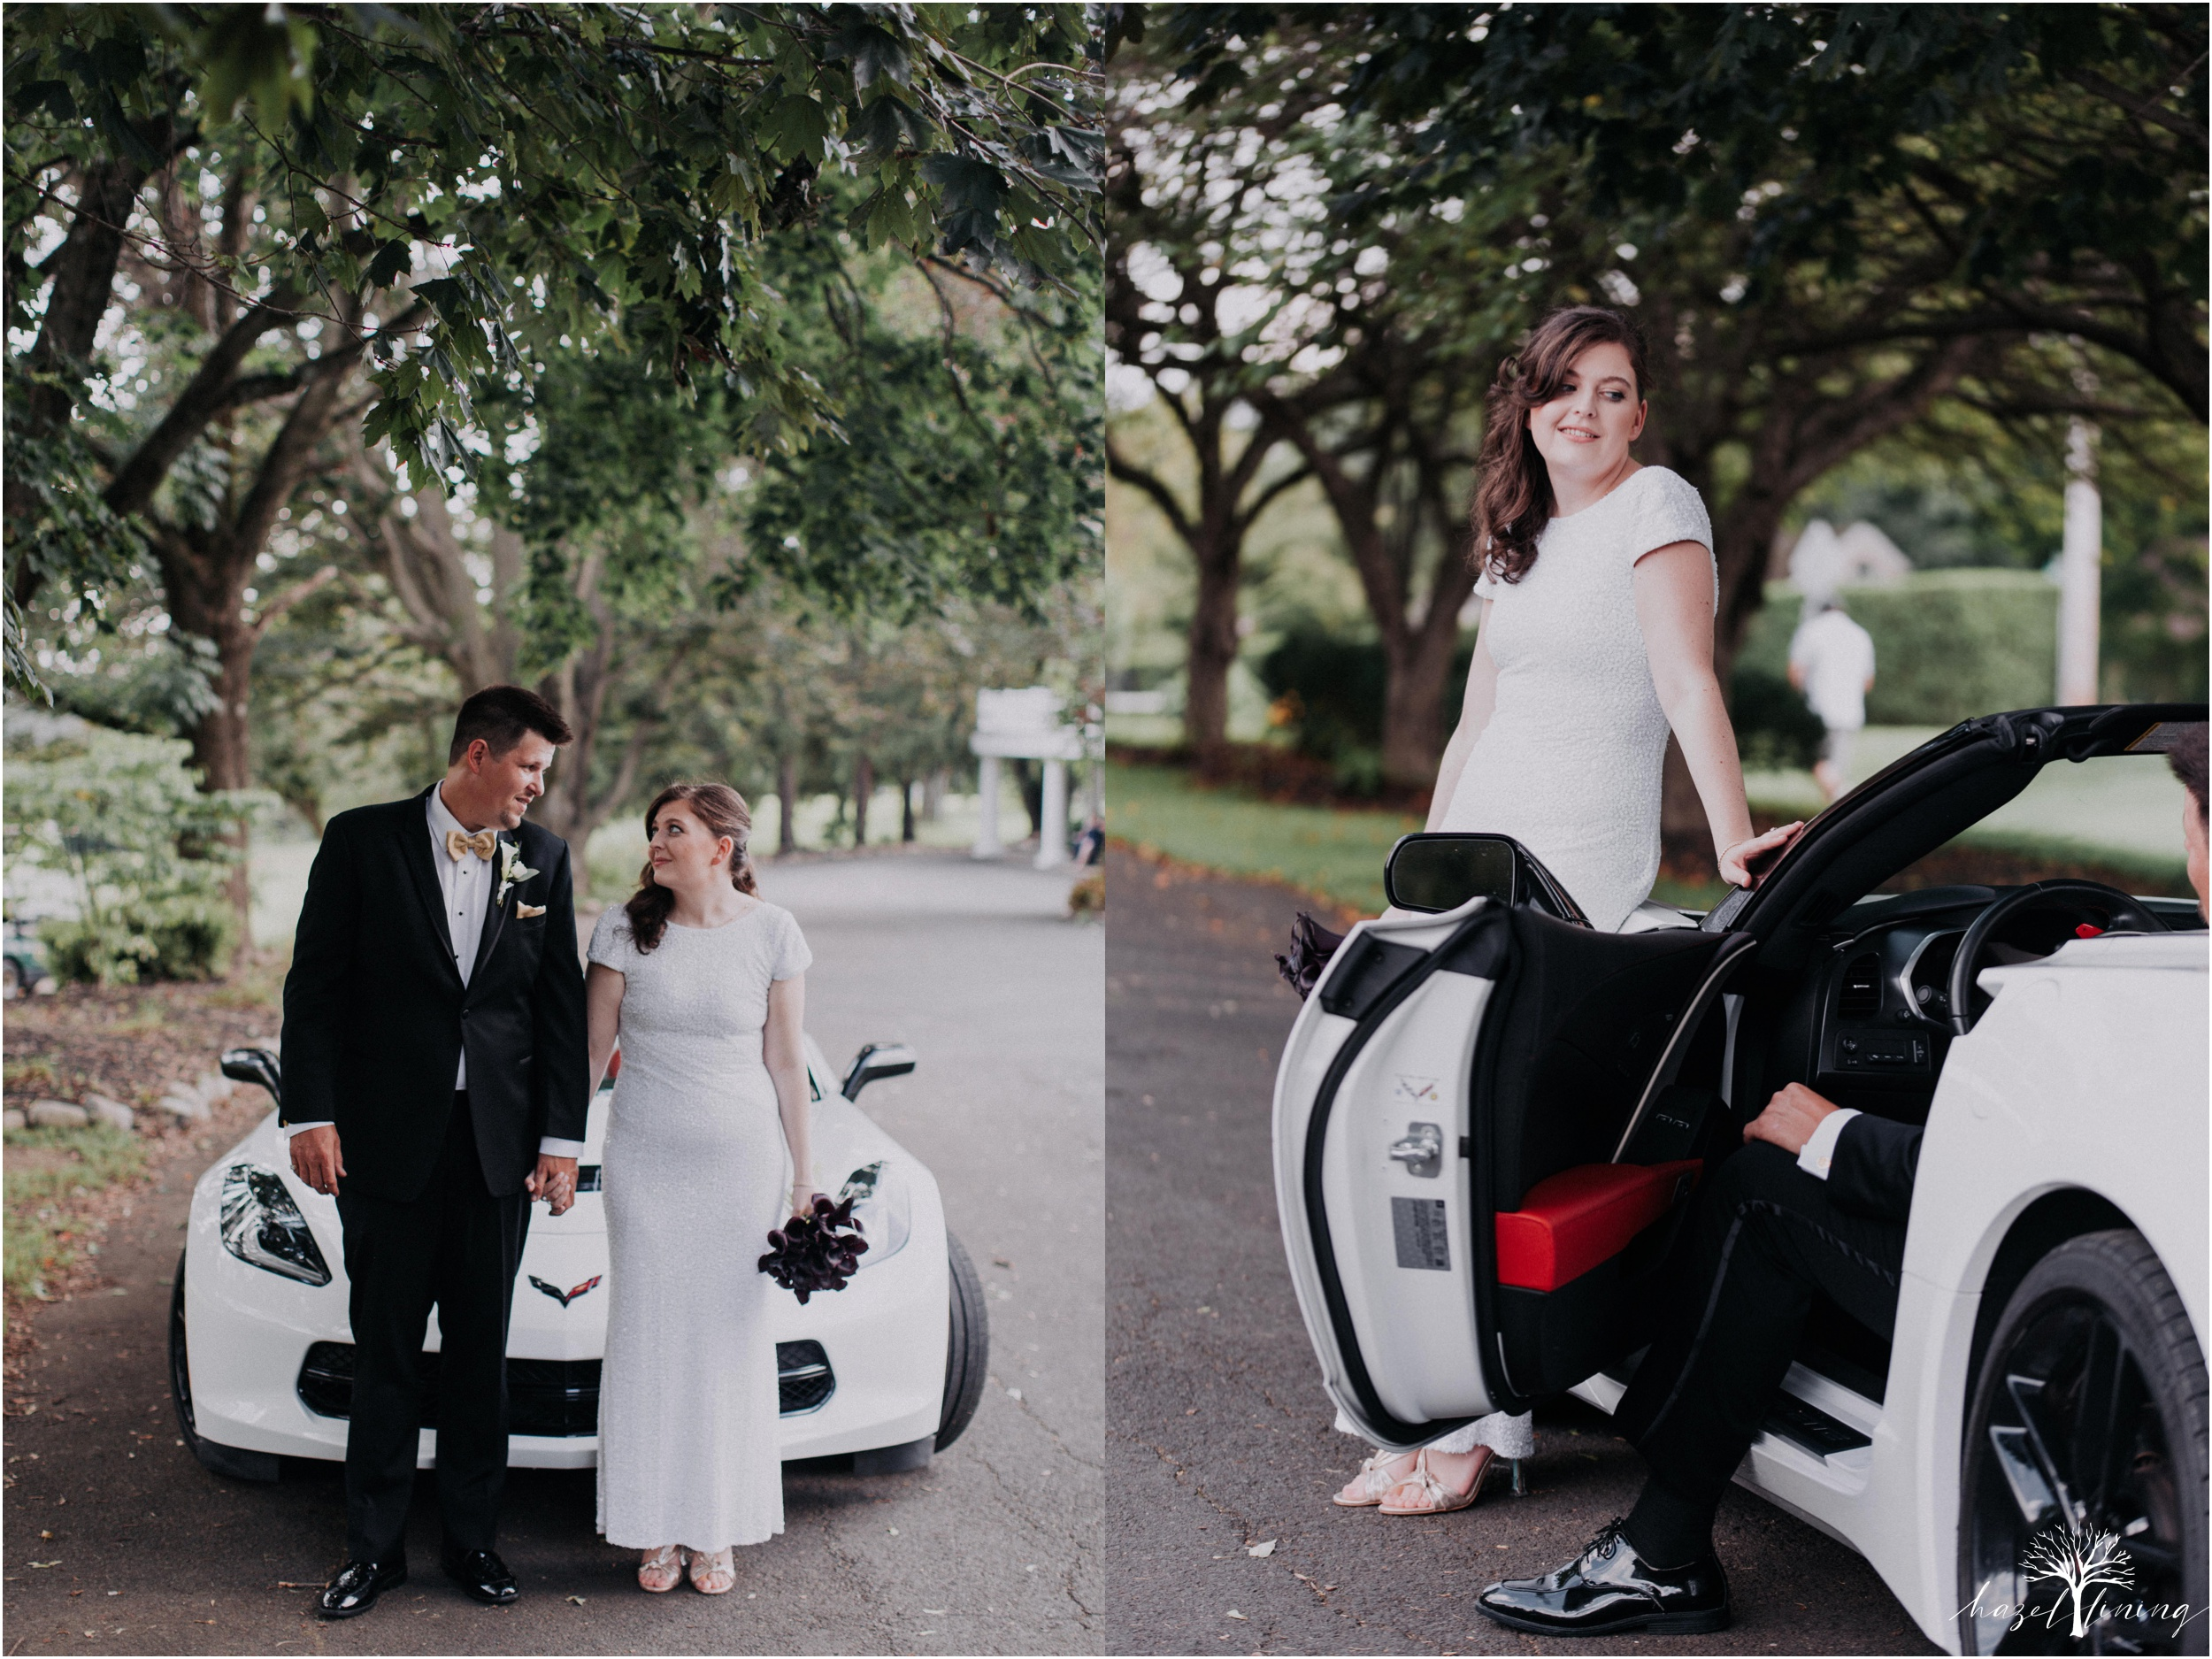 elizabeth-doelp-andrew-foreback-middletown-country-club-summer-langhorne-pennsylvania-wedding-hazel-lining-travel-wedding-elopement-photography_0084.jpg